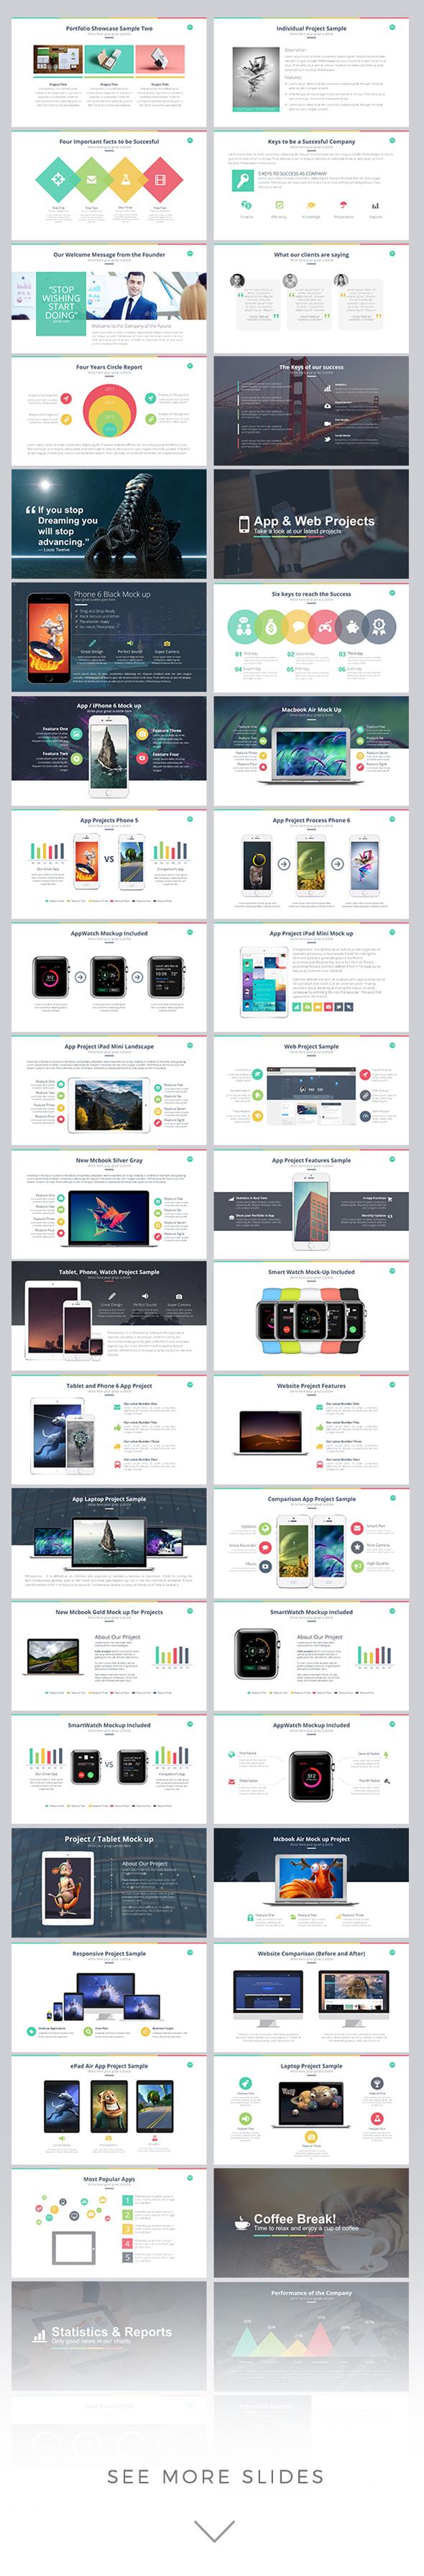 marketer powerpoint template